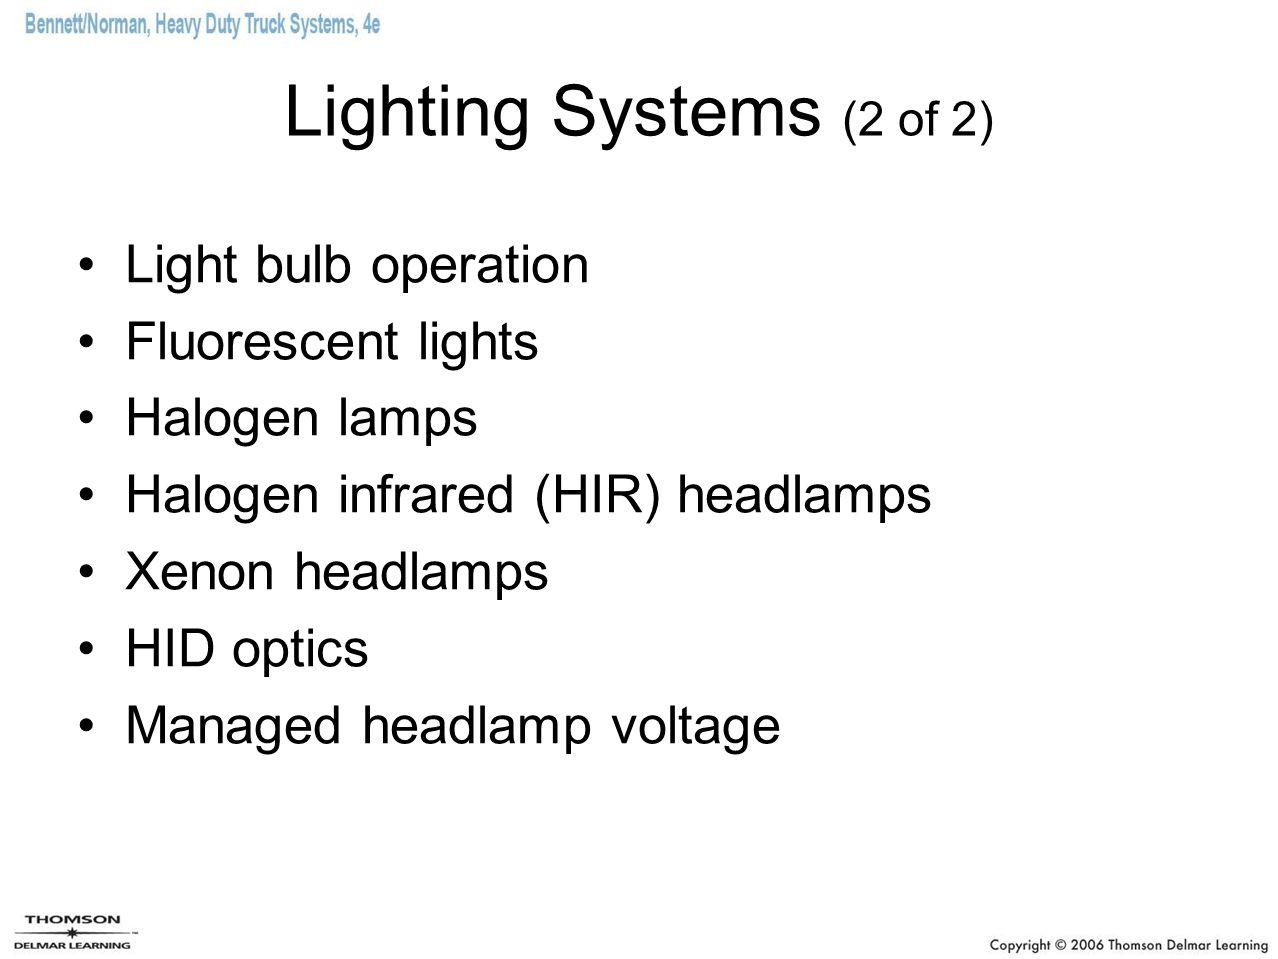 Lighting Systems (2 of 2) Light bulb operation Fluorescent lights Halogen lamps Halogen infrared (HIR) headlamps Xenon headlamps HID optics Managed he